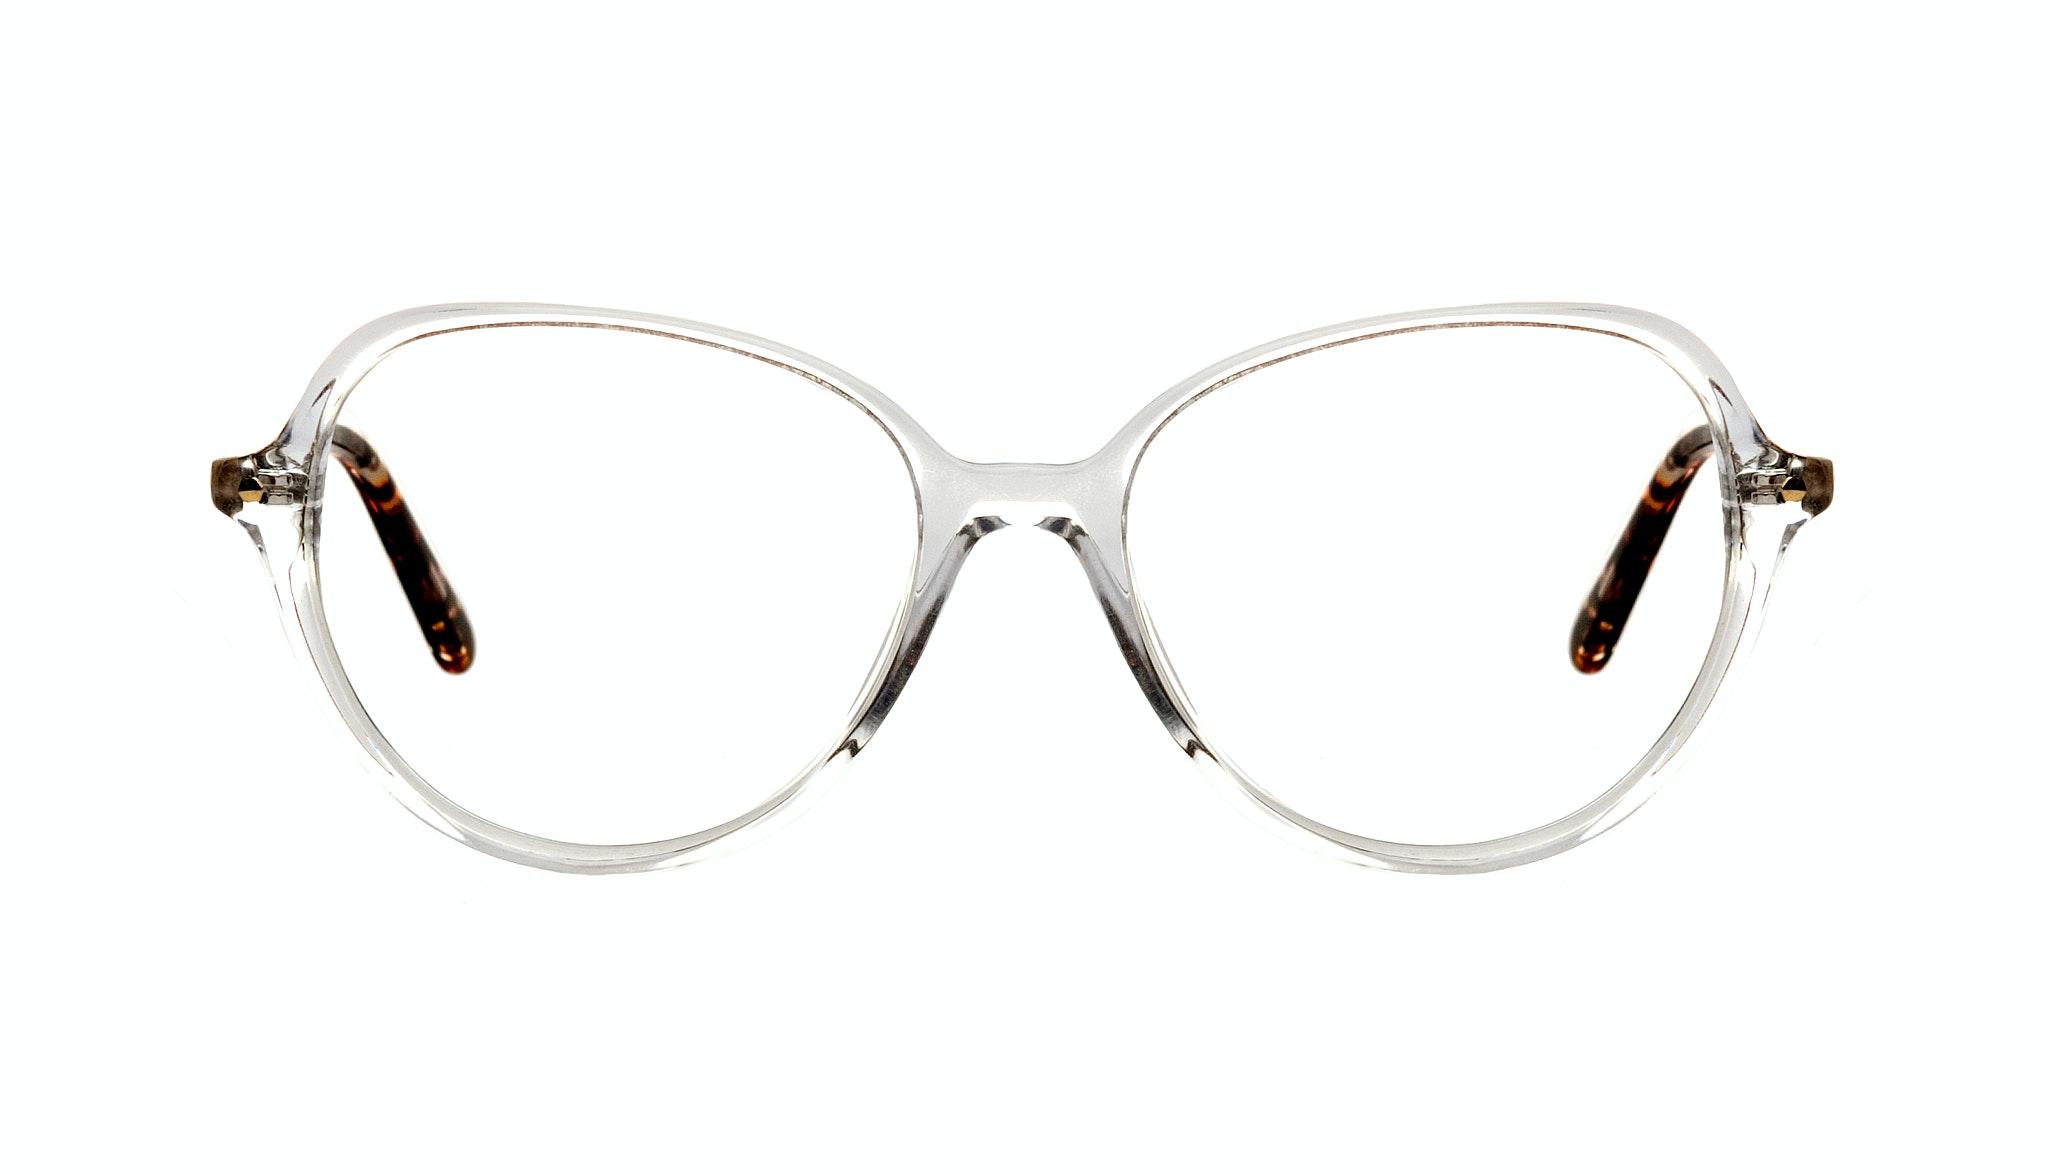 Affordable Fashion Glasses Round Eyeglasses Women Dazzle Diamond Lava Front